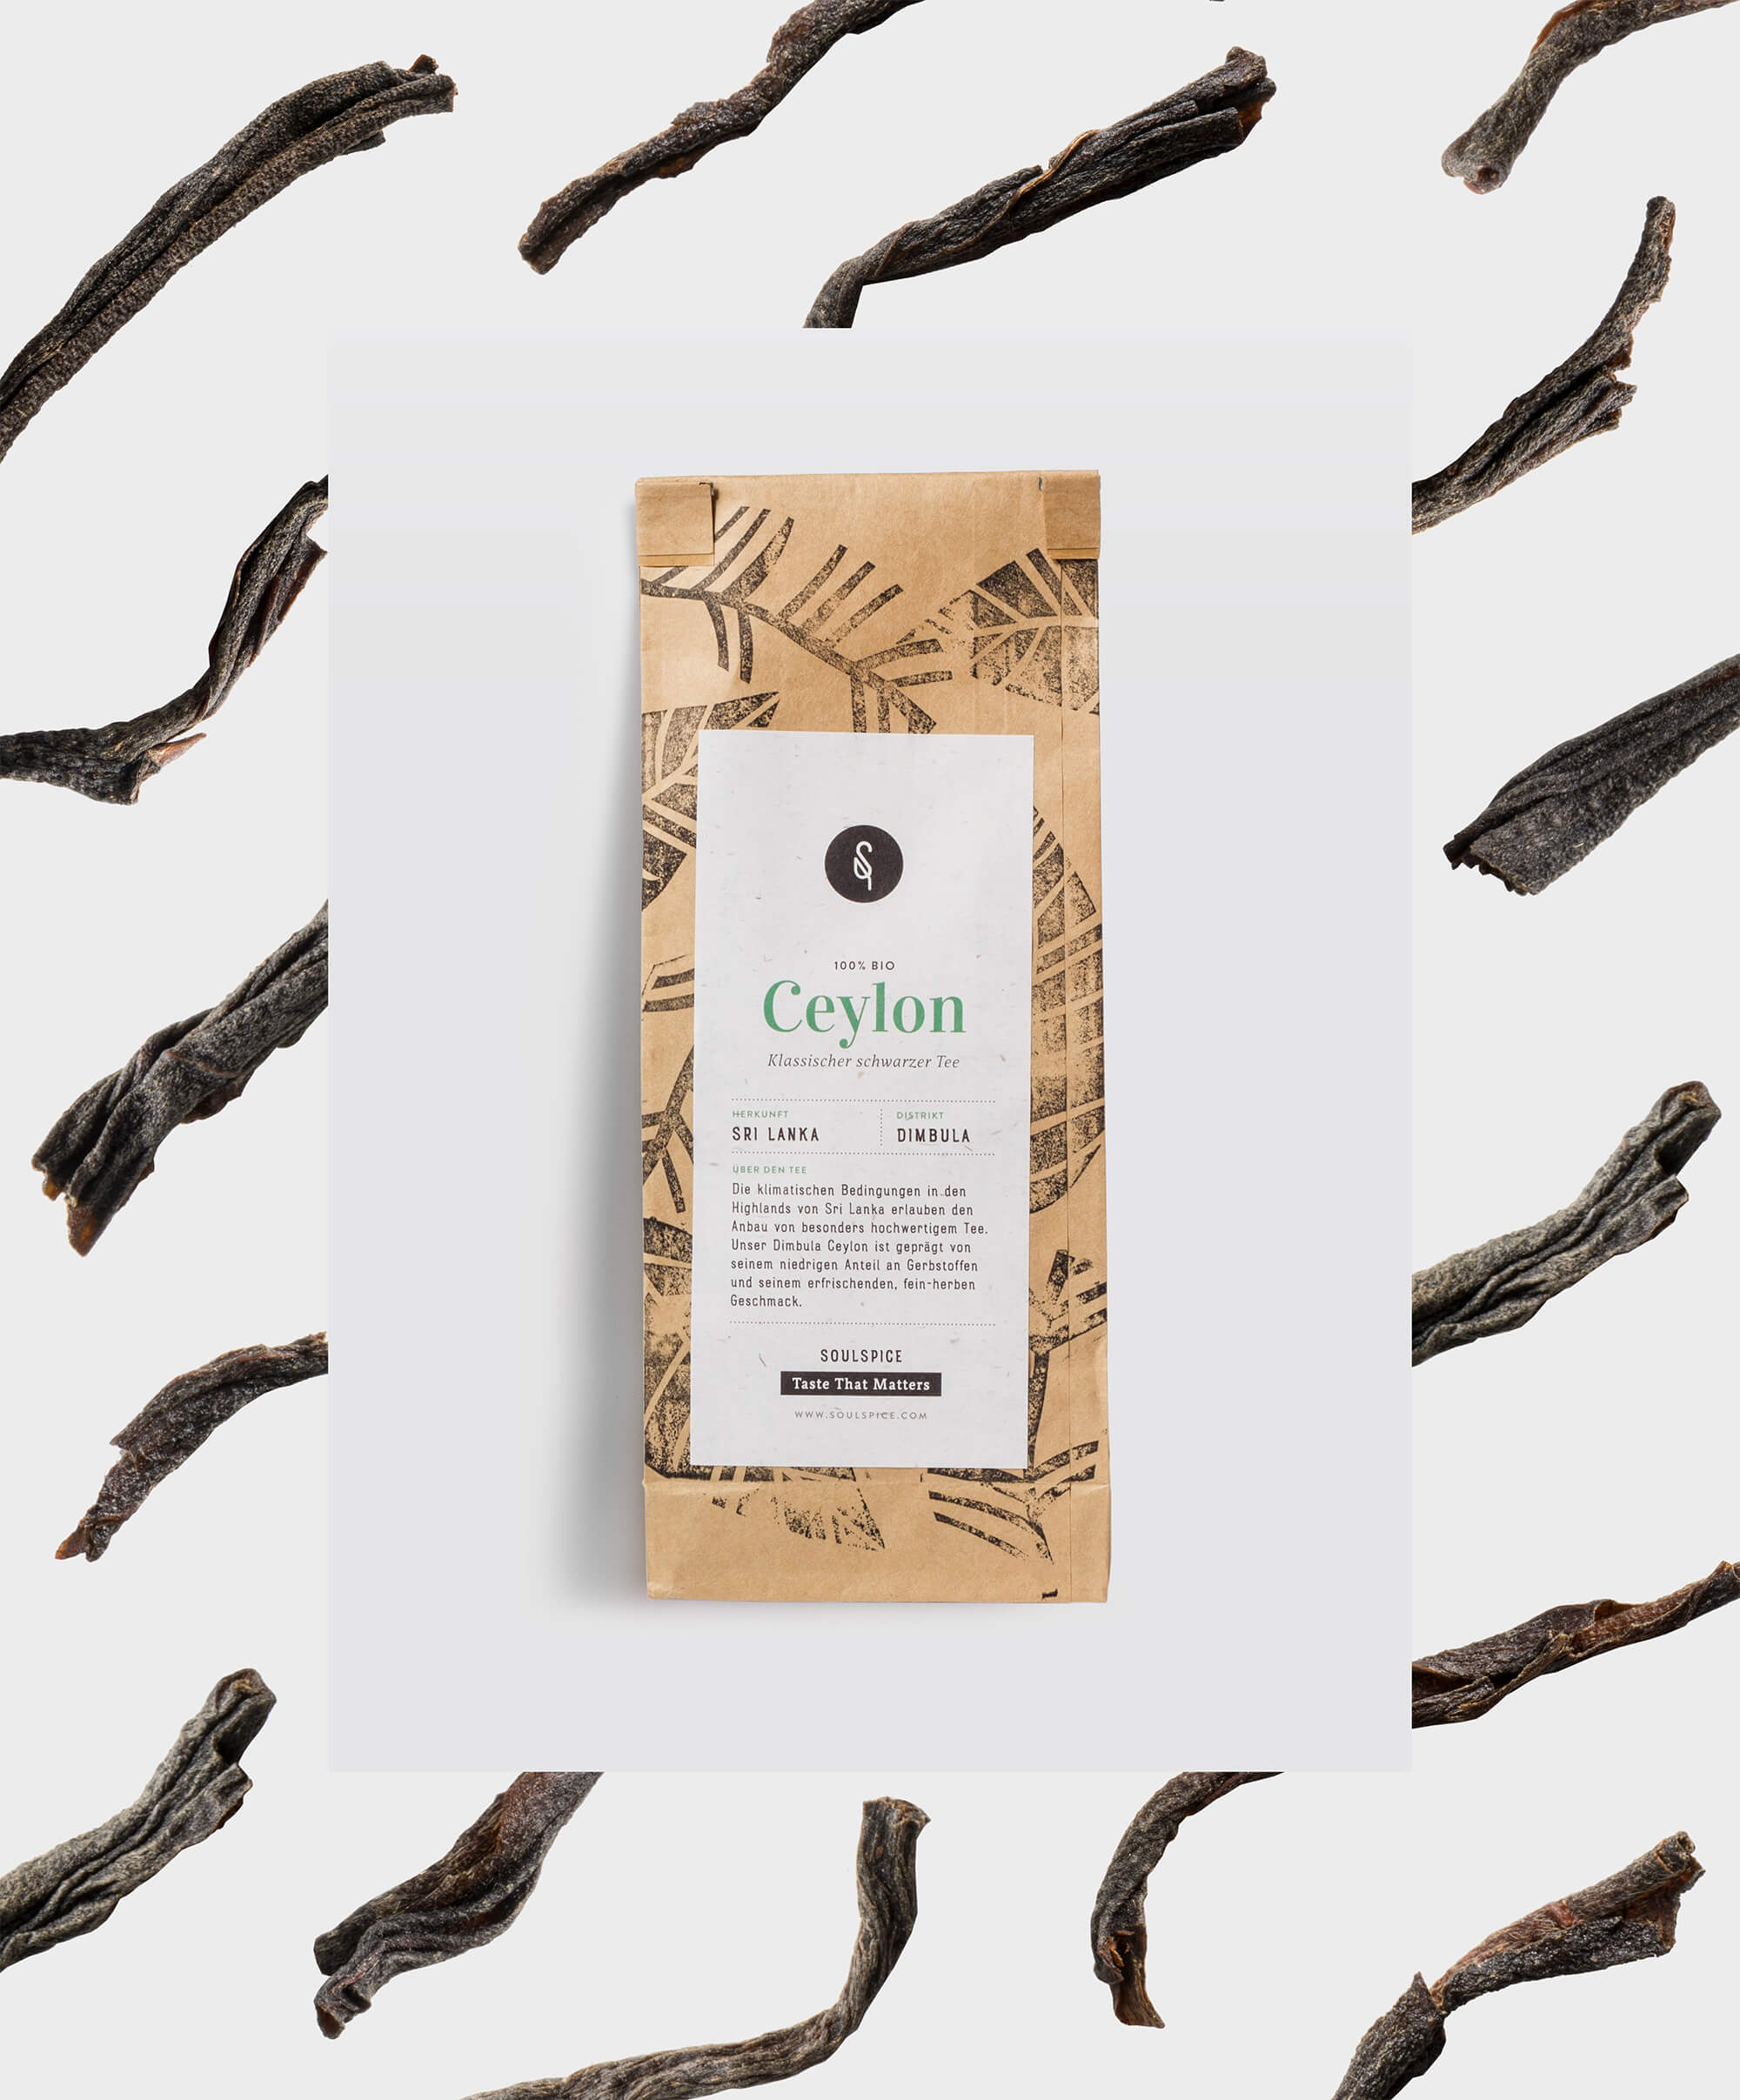 Packaging des Ceylon Tees